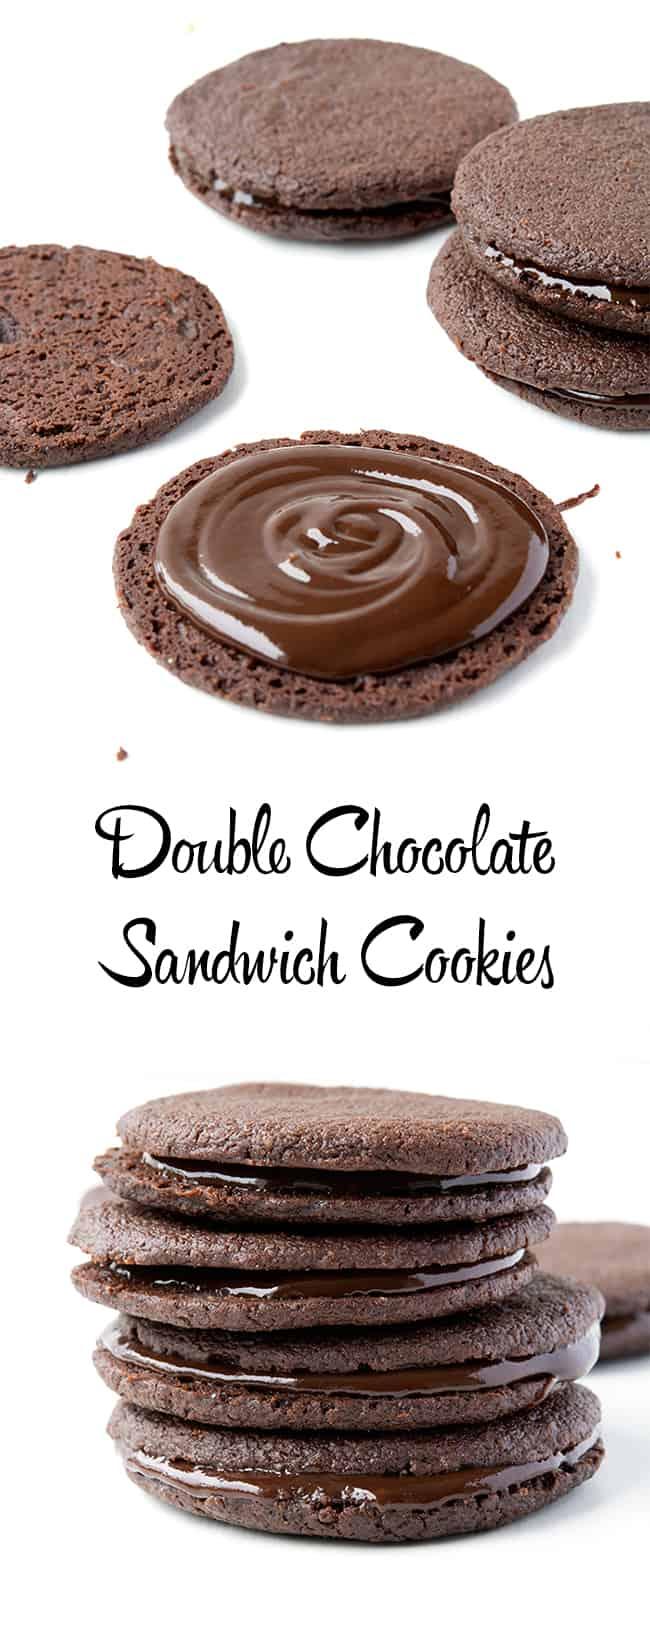 Double Chocolate Sandwich Cookies | Sweetest Menu